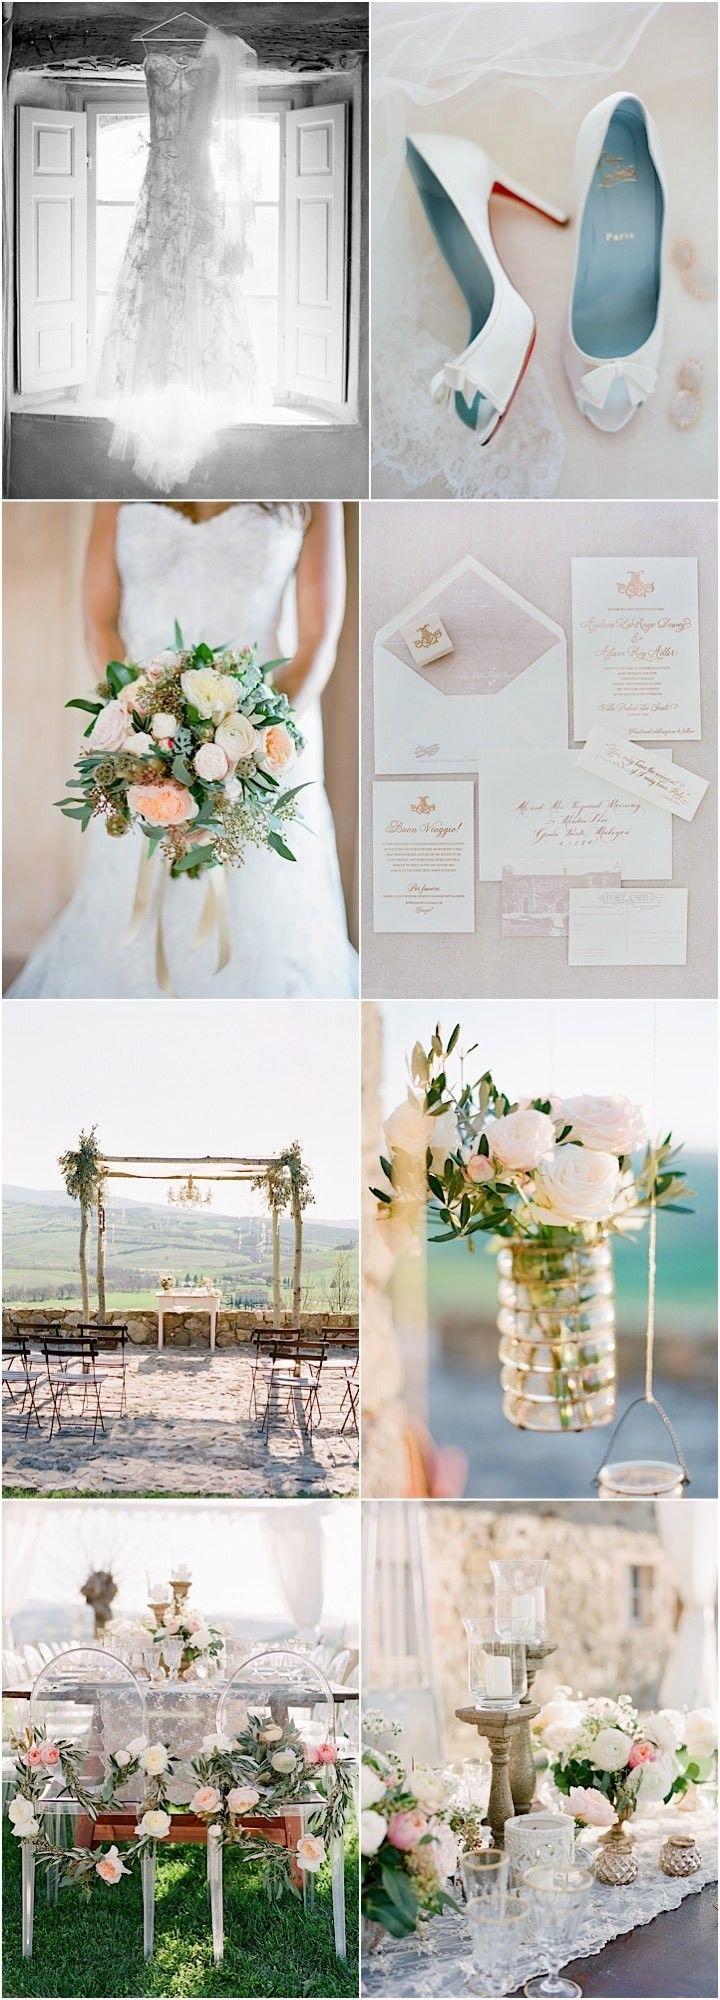 photo: Jose Villa; Destination Wedding: Spring Romance in Tuscany